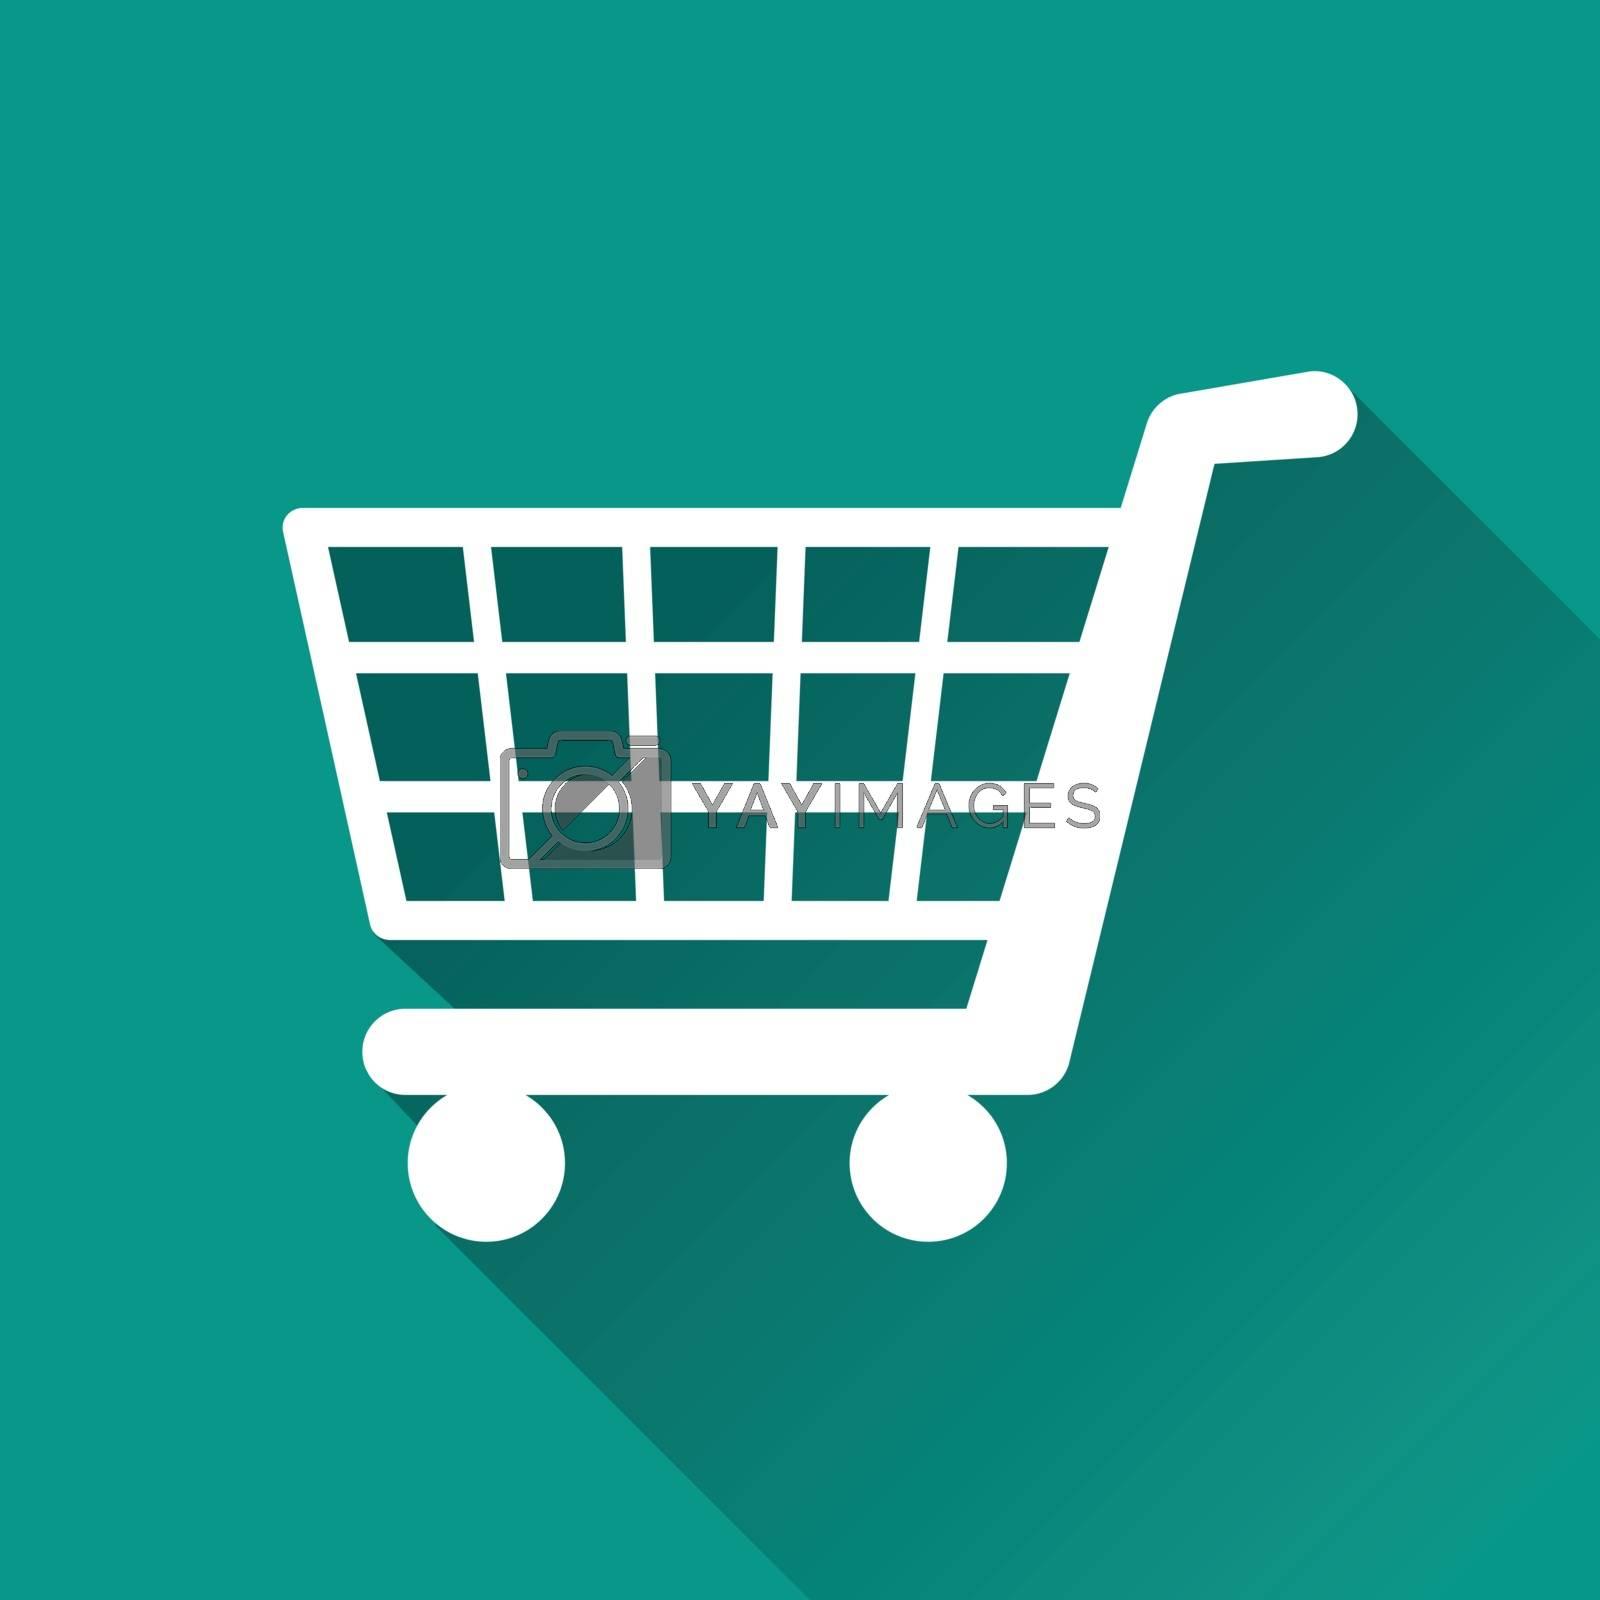 Royalty free image of shopping flat design icon by nickylarson974